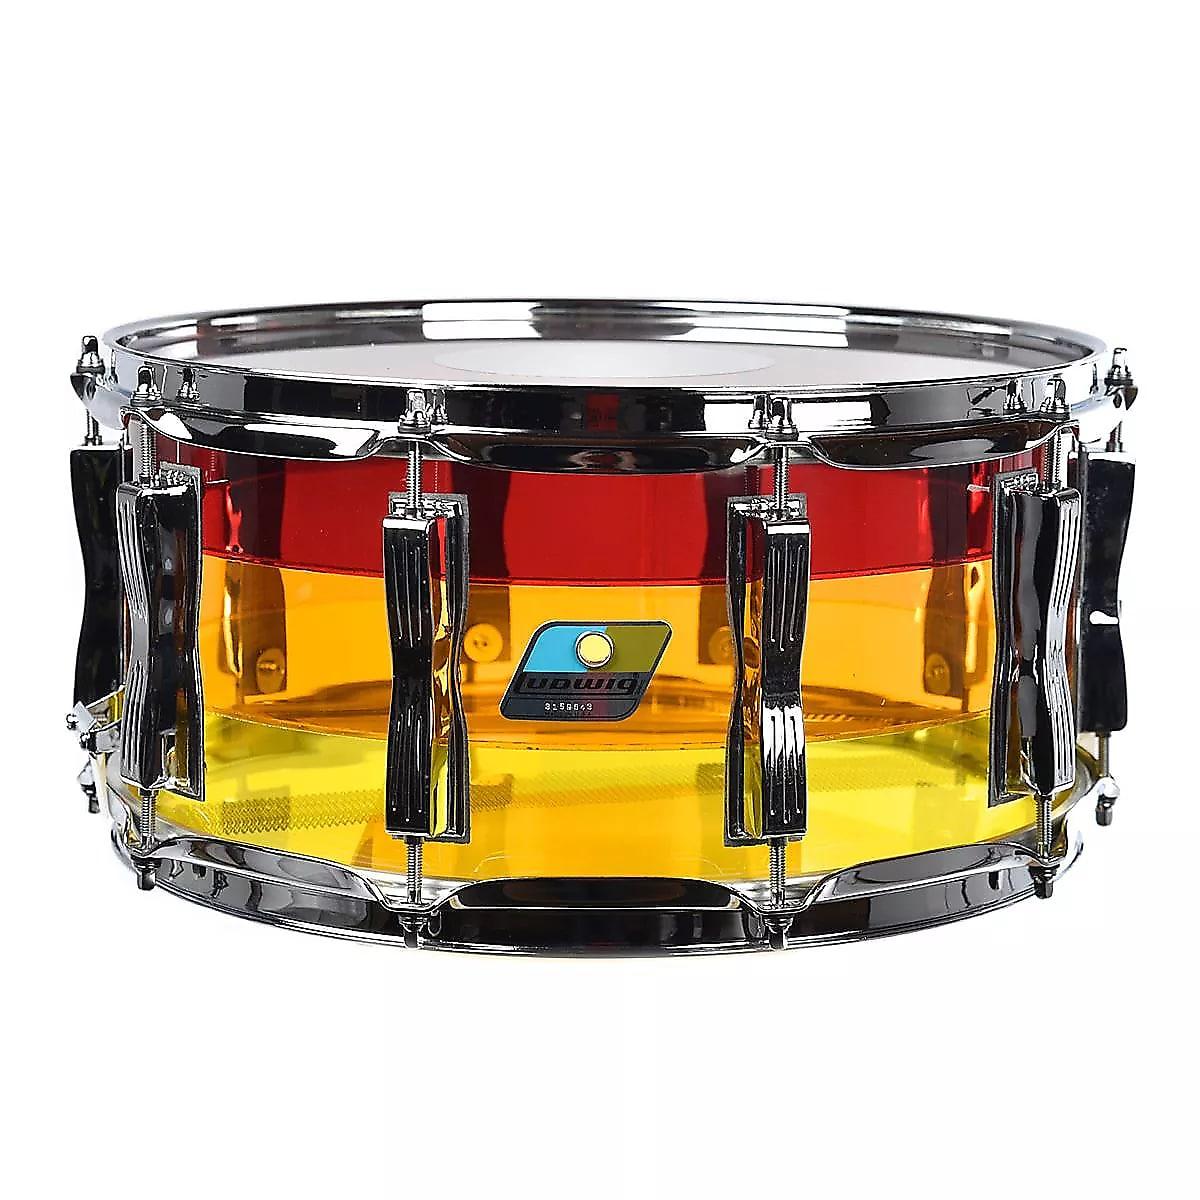 Ludwig Vistalite Tequila Sunrise Pro Beat Kit 14x24/16x18/16x16/9x13 +Matching 6.5x14 Snare+GigBags!